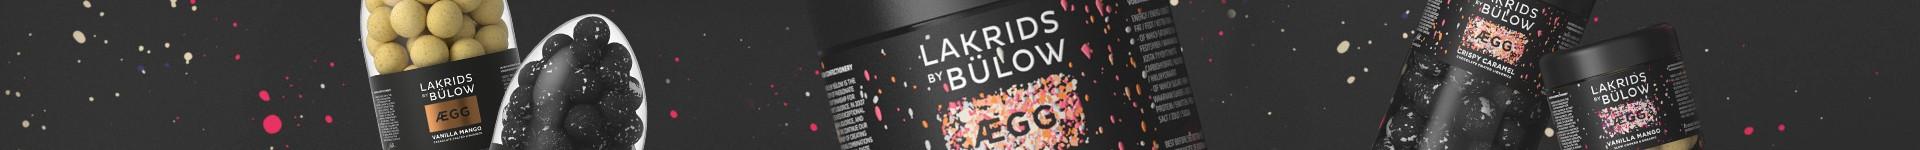 Bestil dine Lakrids By Bülow favoritter her!